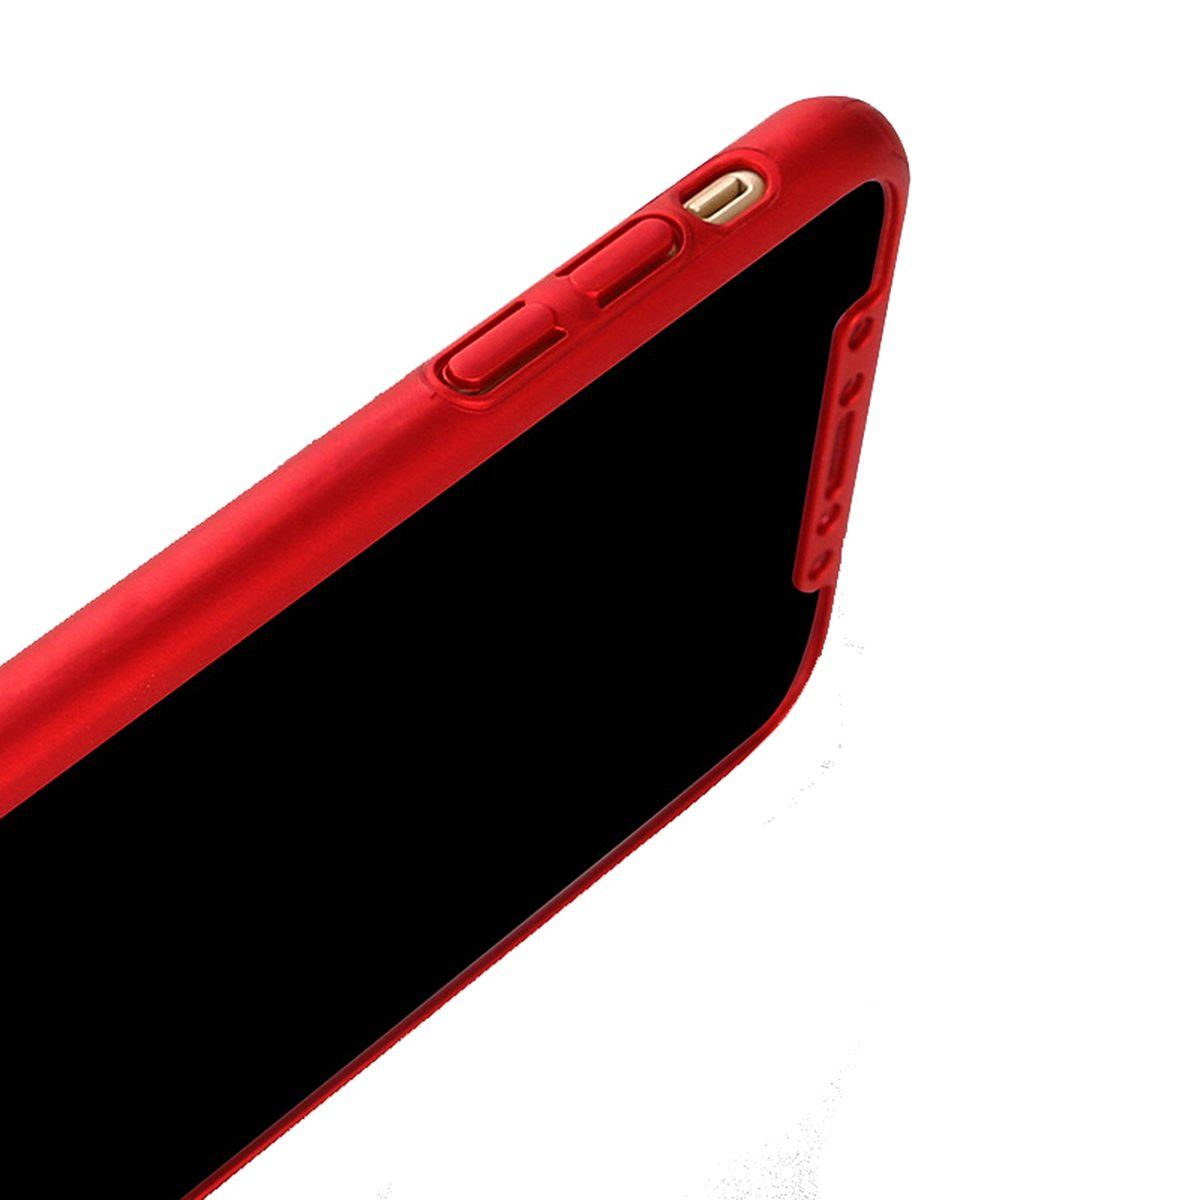 For-Apple-iPhone-XS-Max-XR-Hybrid-360-Slim-Ultra-Thin-Heavy-Duty-Shockproof-Case Indexbild 41